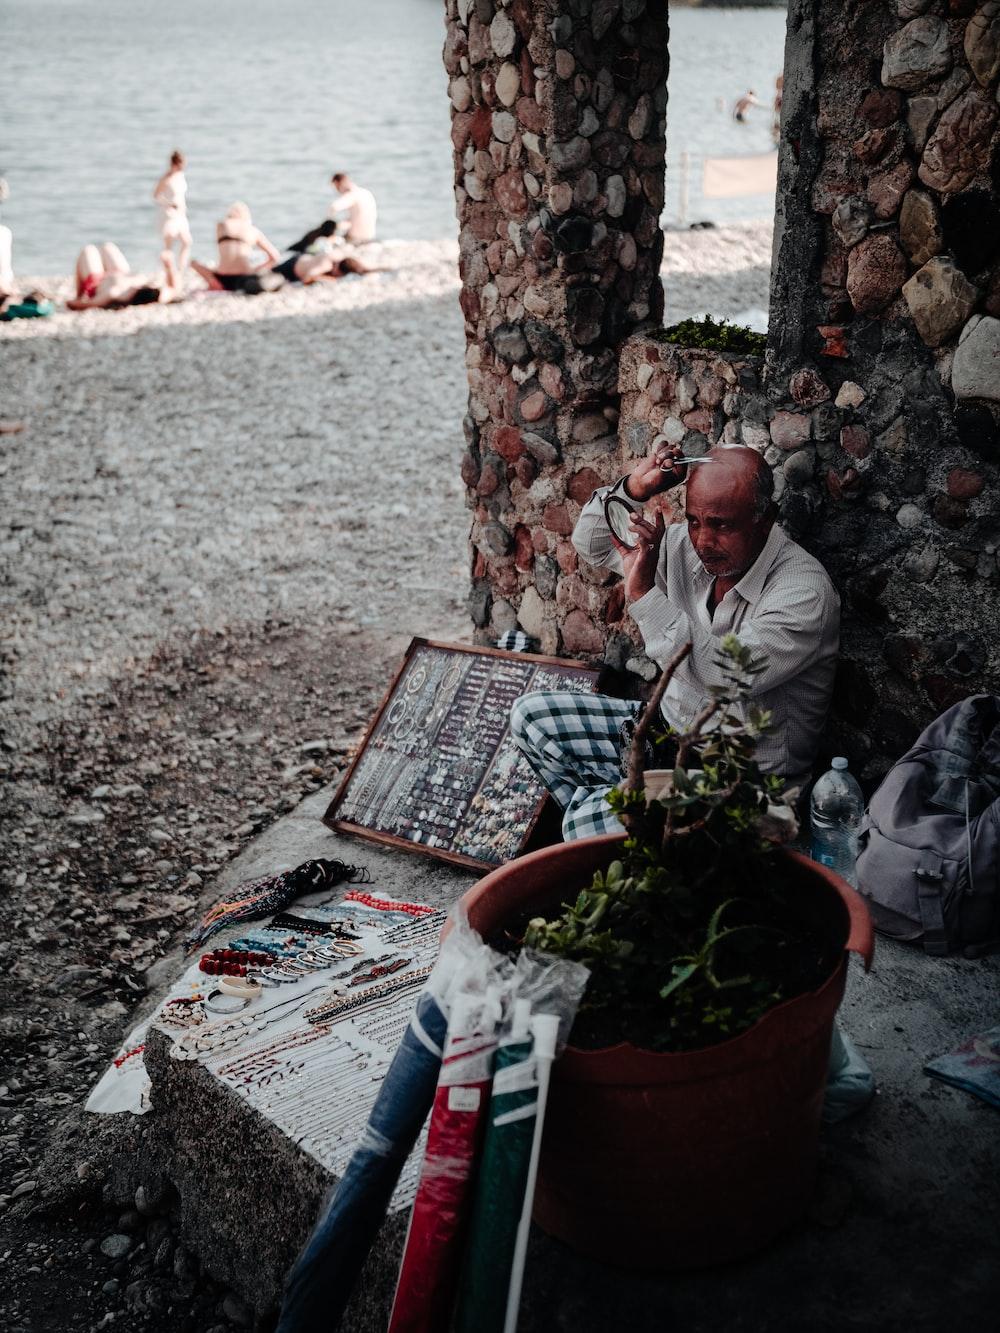 man in white dress shirt sitting on brown wooden bench